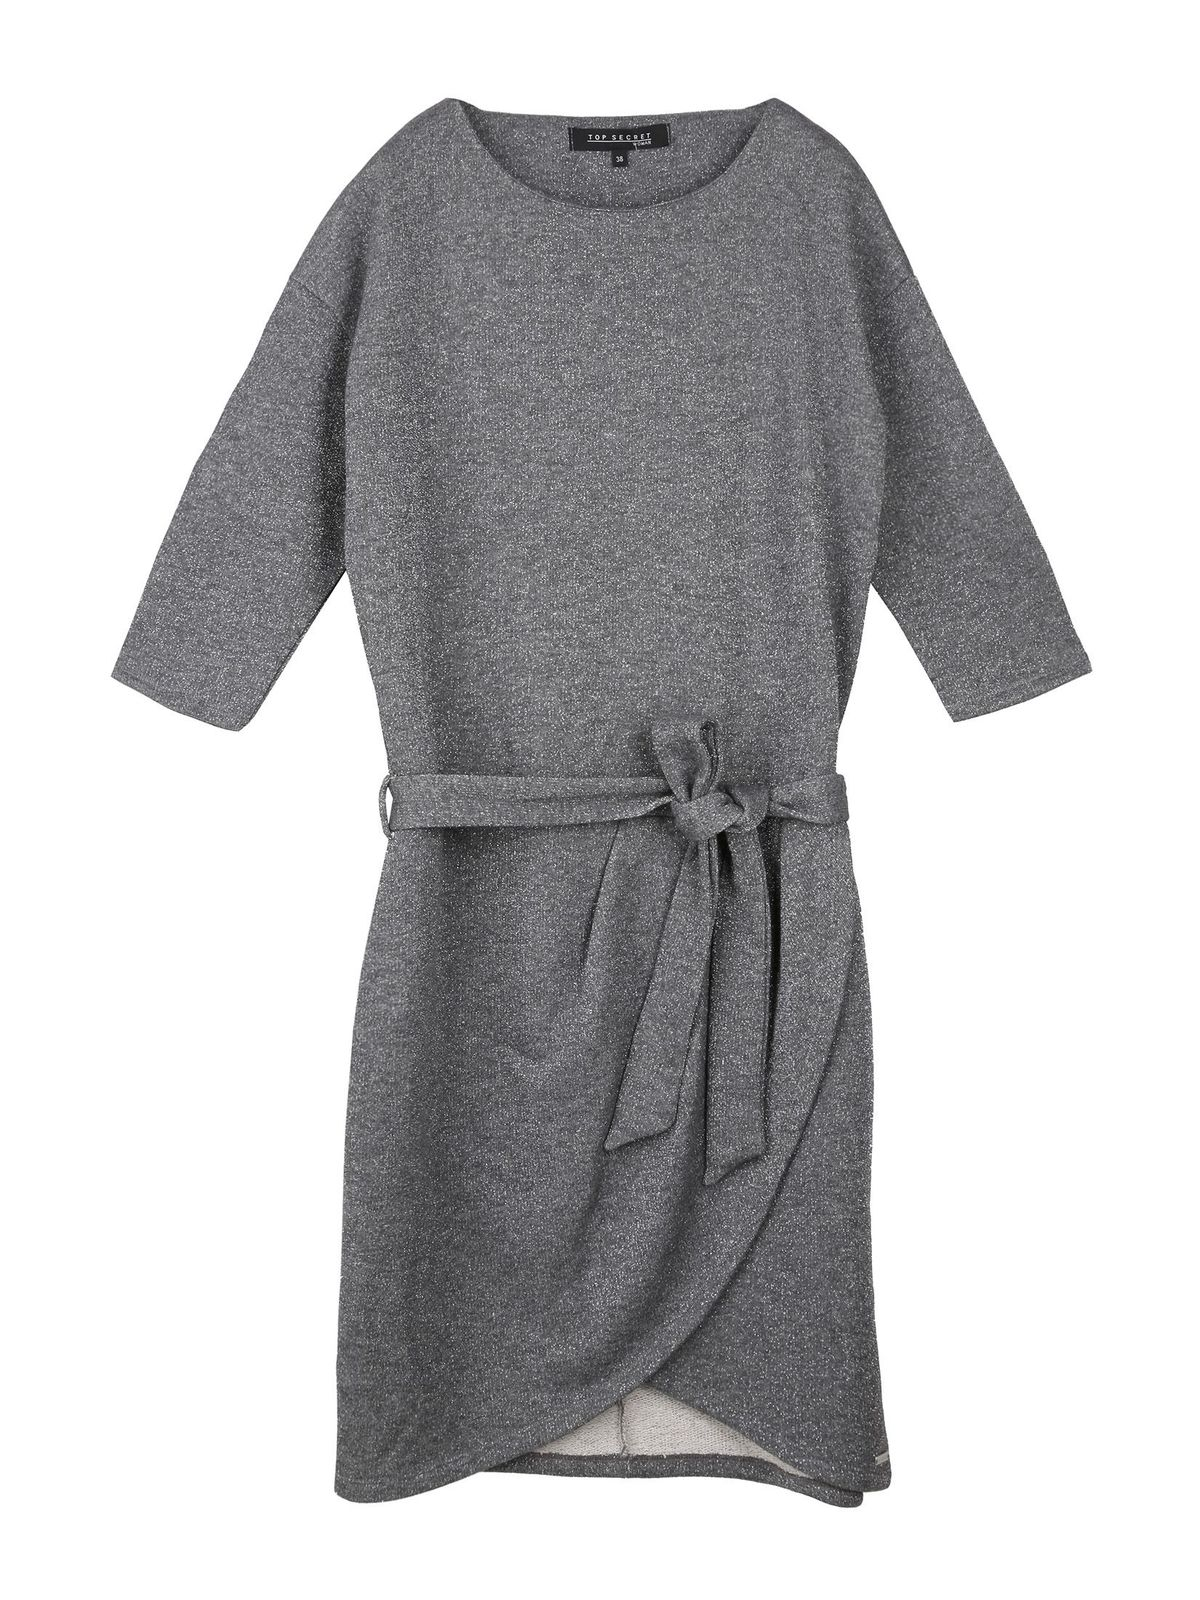 7106df5651f Γυναικεία Ρούχα, Γυναικεία Φορέματα, Βραδινά Φορέματα